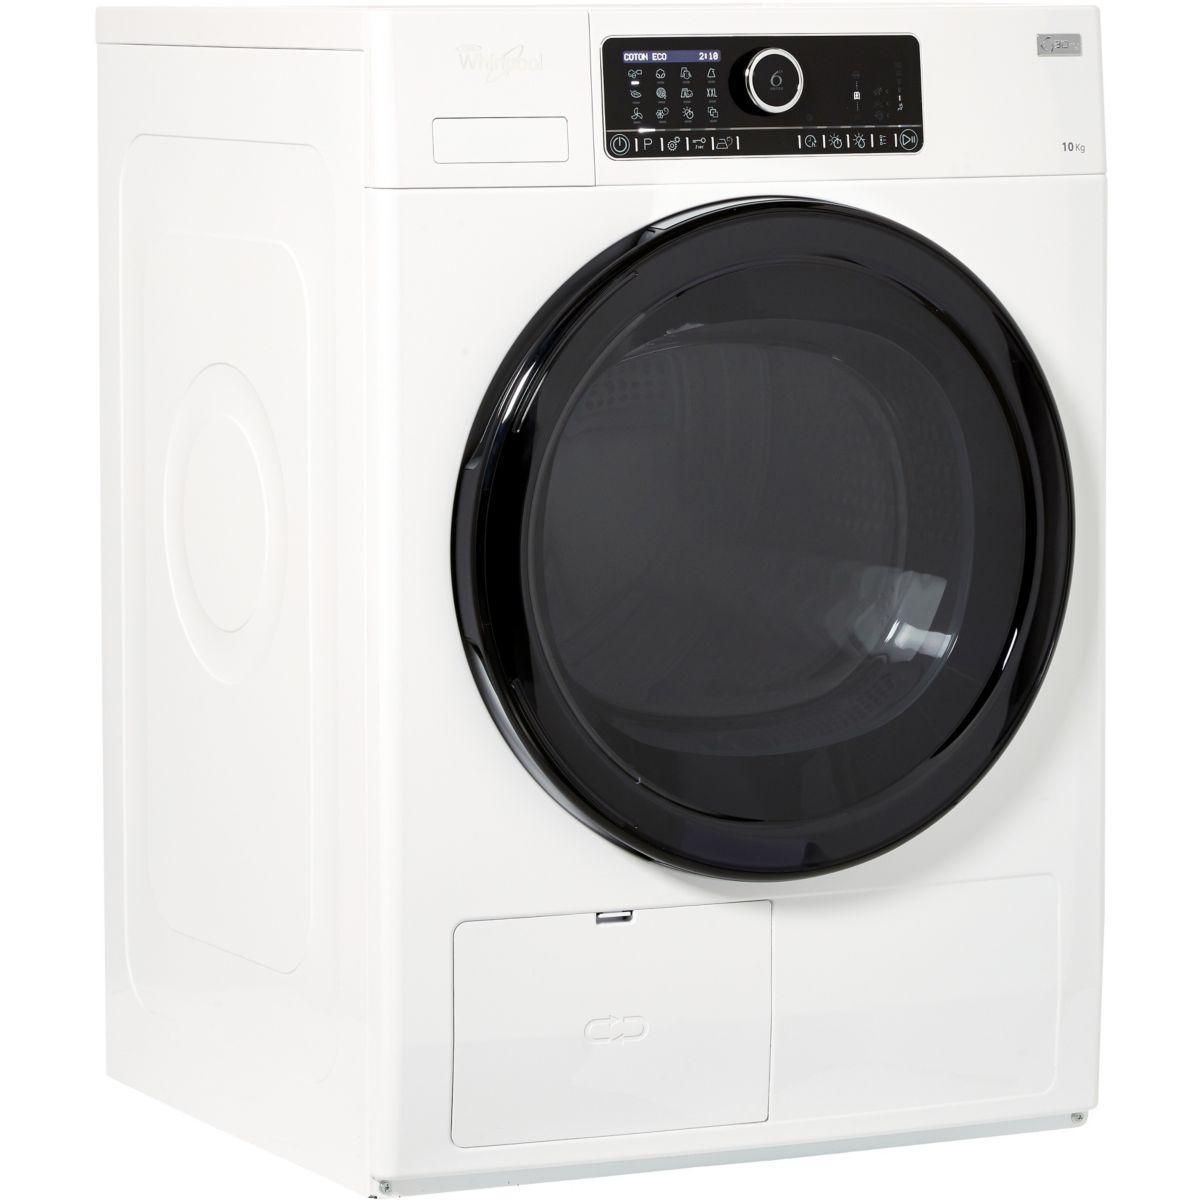 s che linge pompe chaleur frontal whirlpool hscx 10432 reconditionn back market. Black Bedroom Furniture Sets. Home Design Ideas